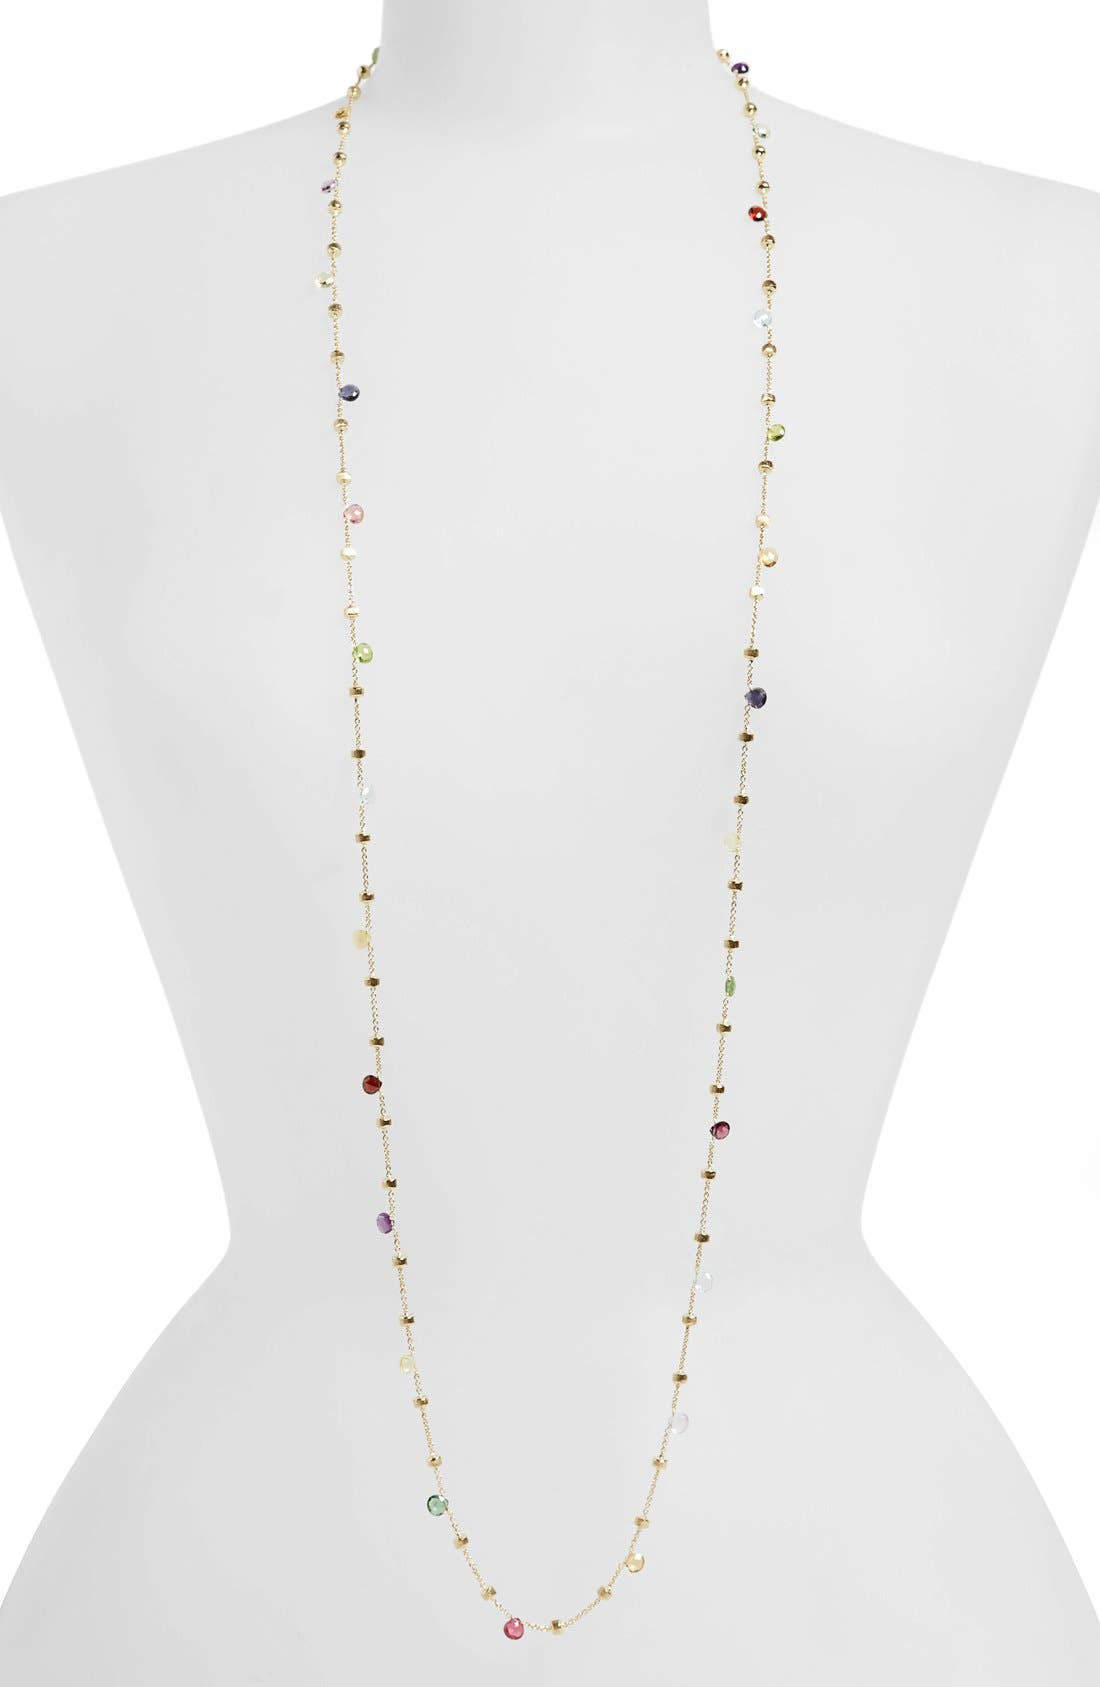 'Paradise' Semiprecious Stone Long Necklace,                             Main thumbnail 1, color,                             YELLOW GOLD/ MULTI